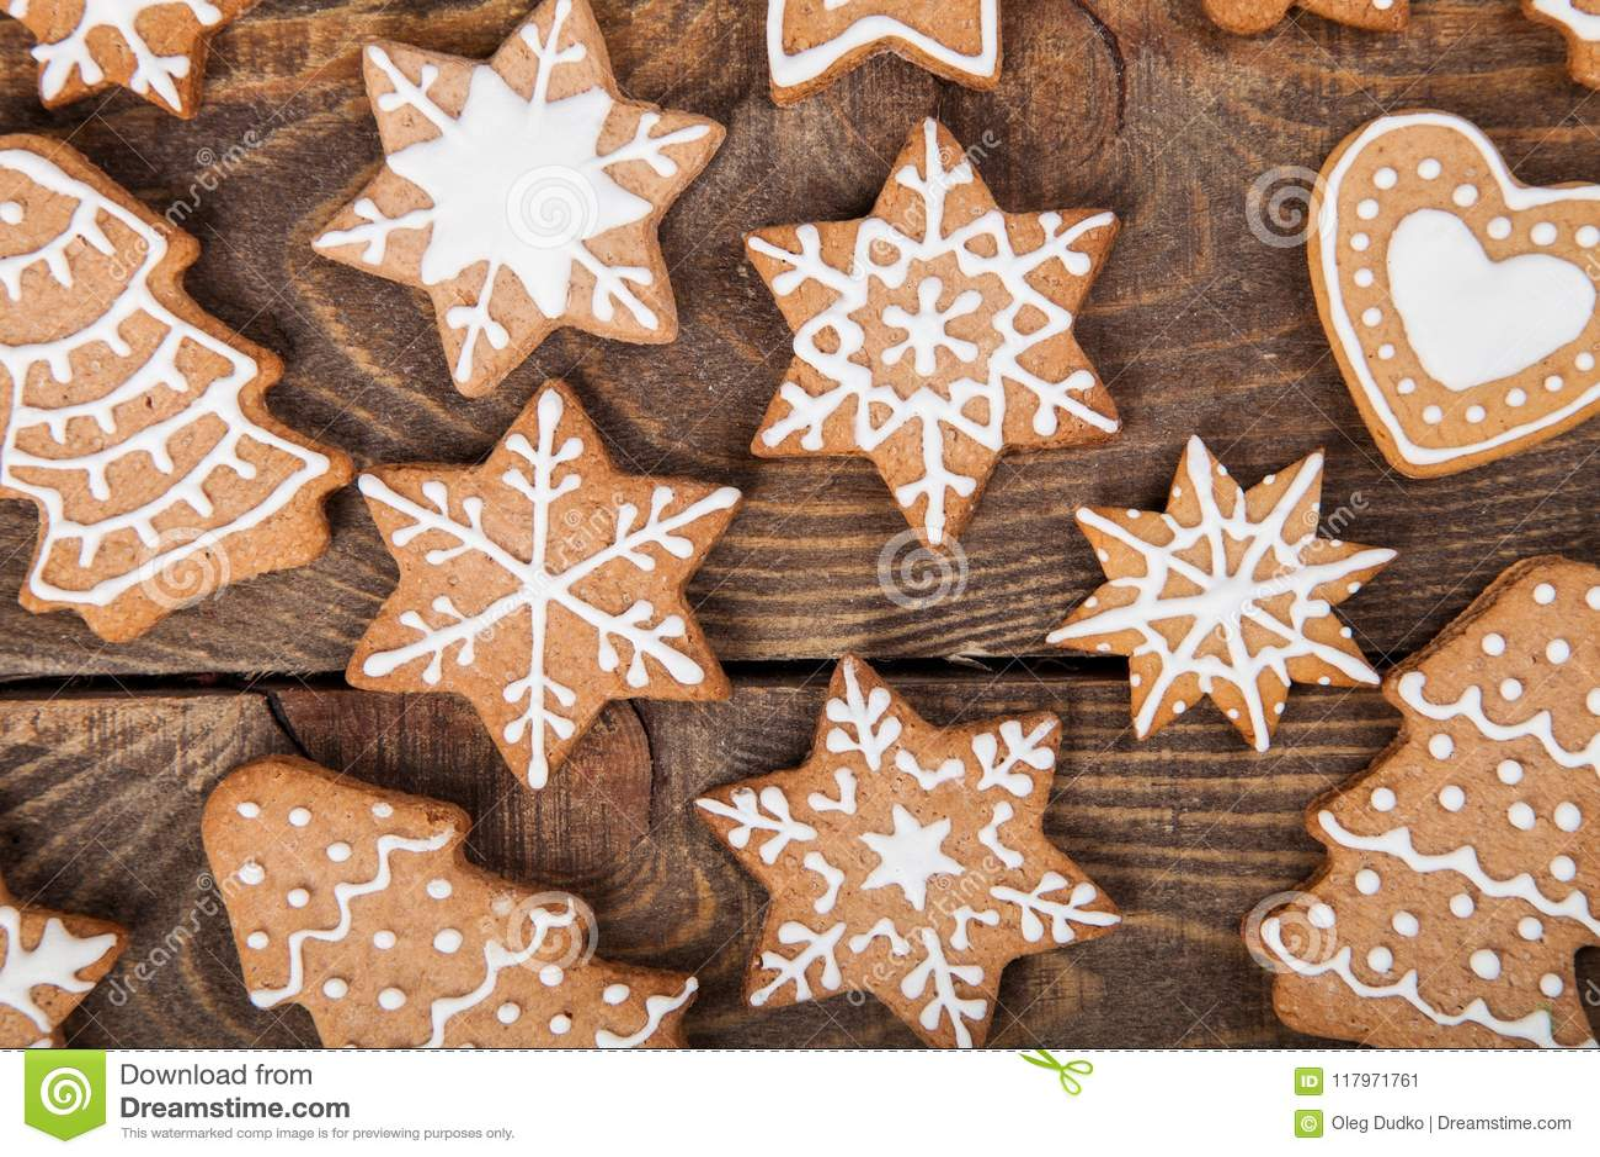 Gingerbread Reindeer Cookies And Christmas Stock Image Image Of